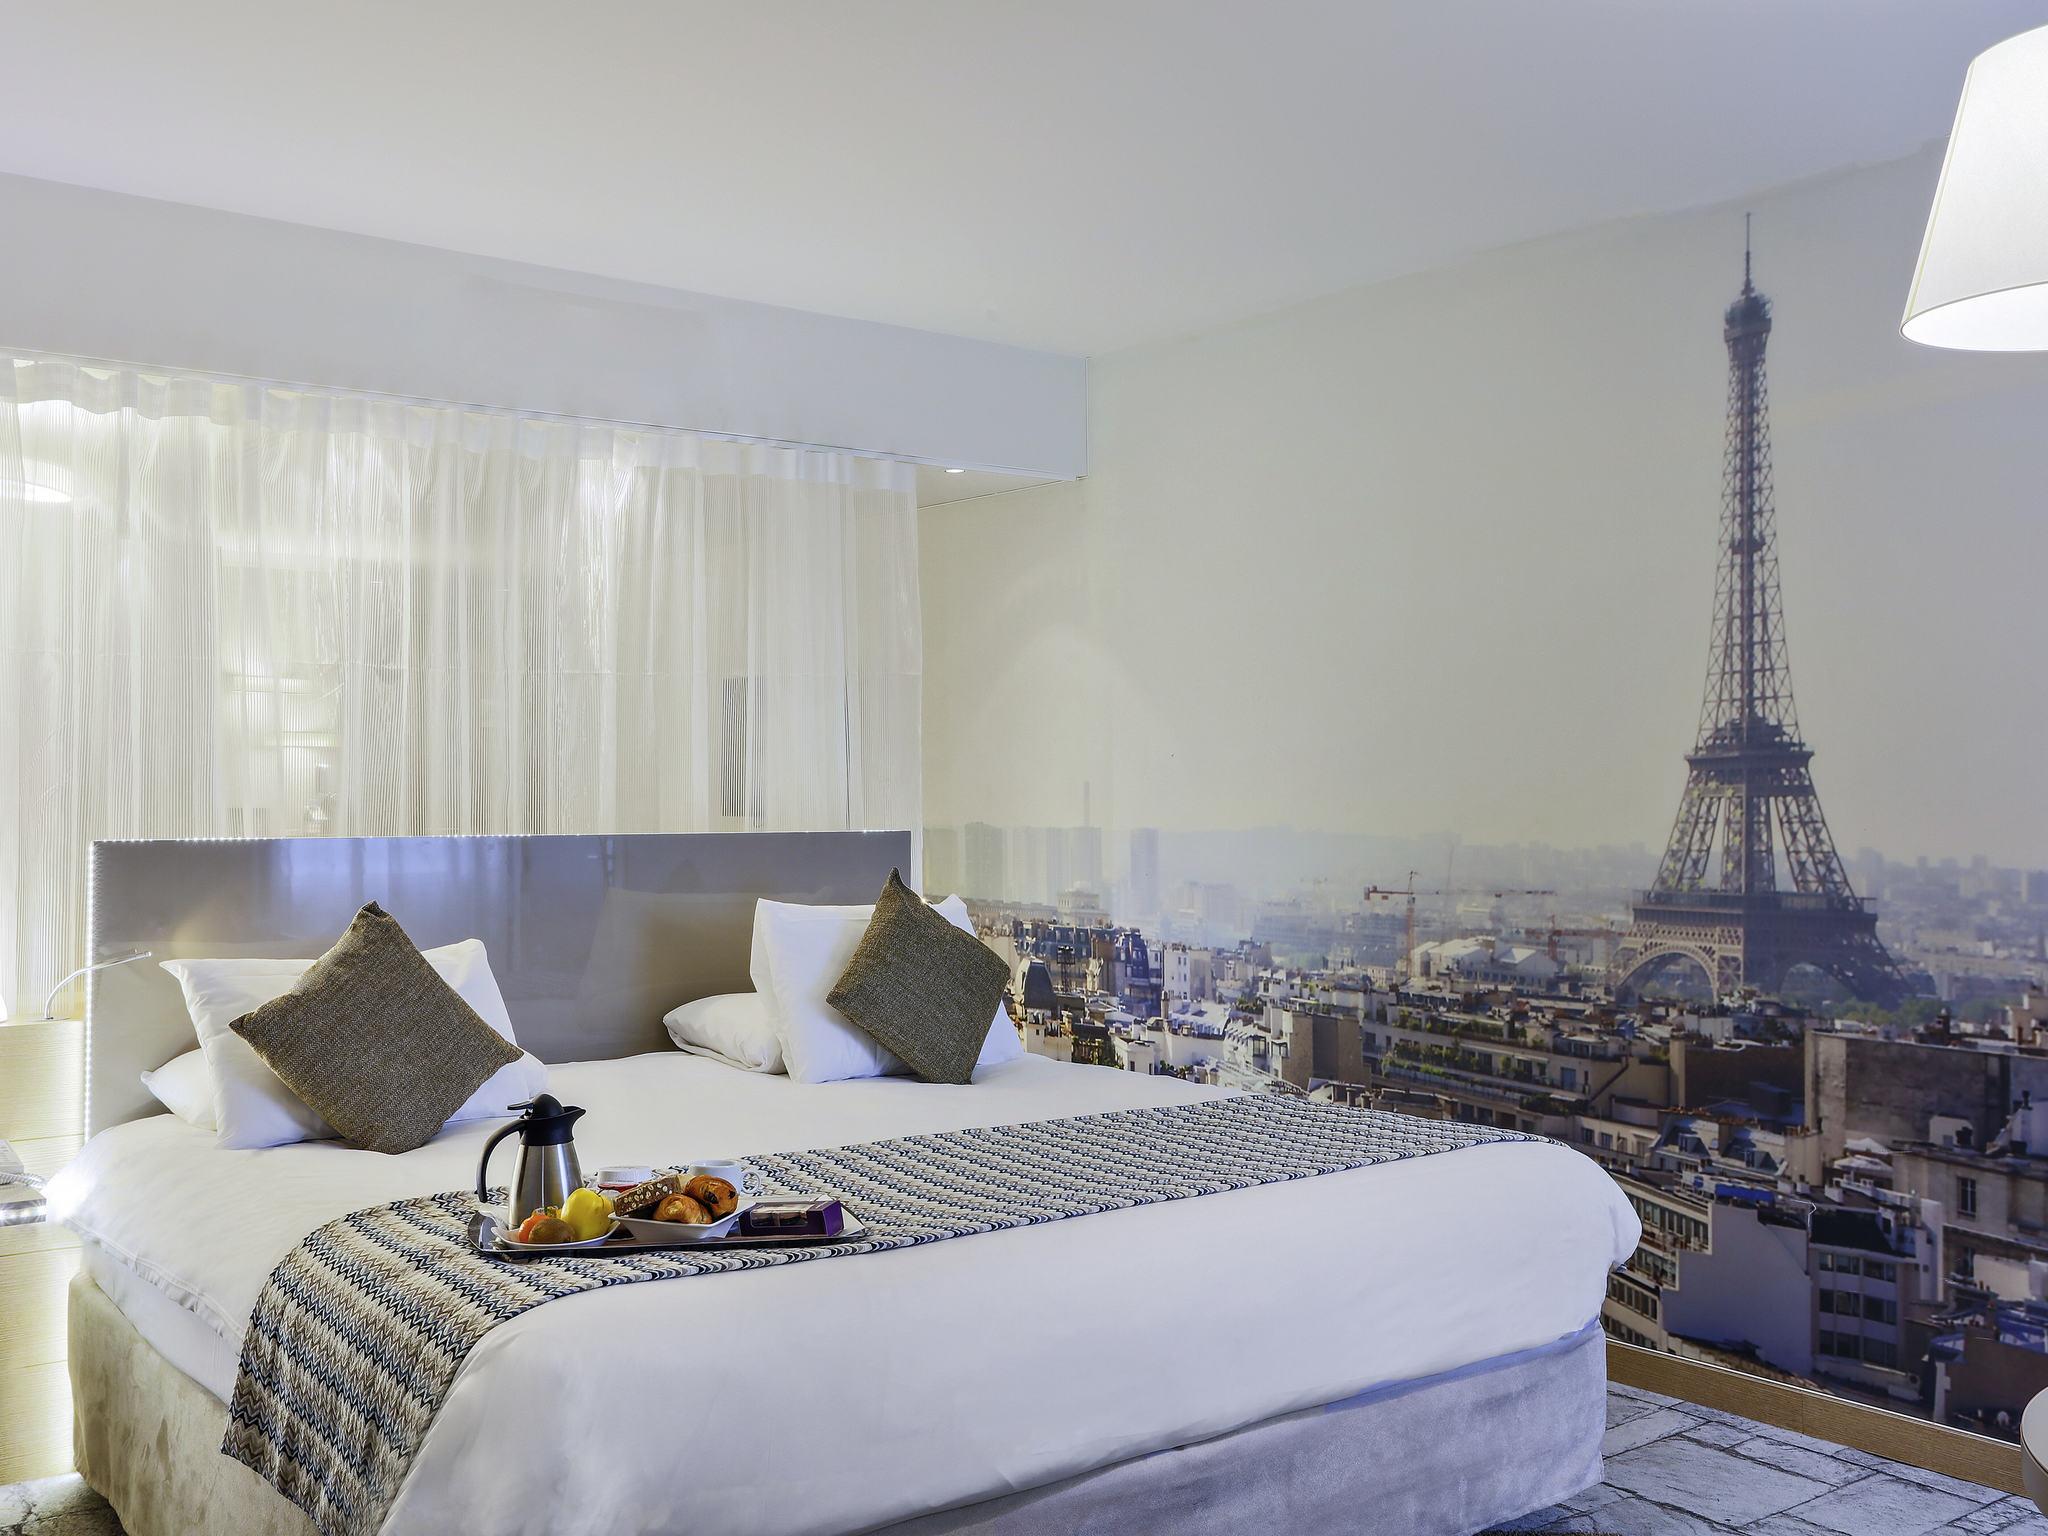 Hotell – Mercure Paris Vaugirard Porte de Versailles Hotel